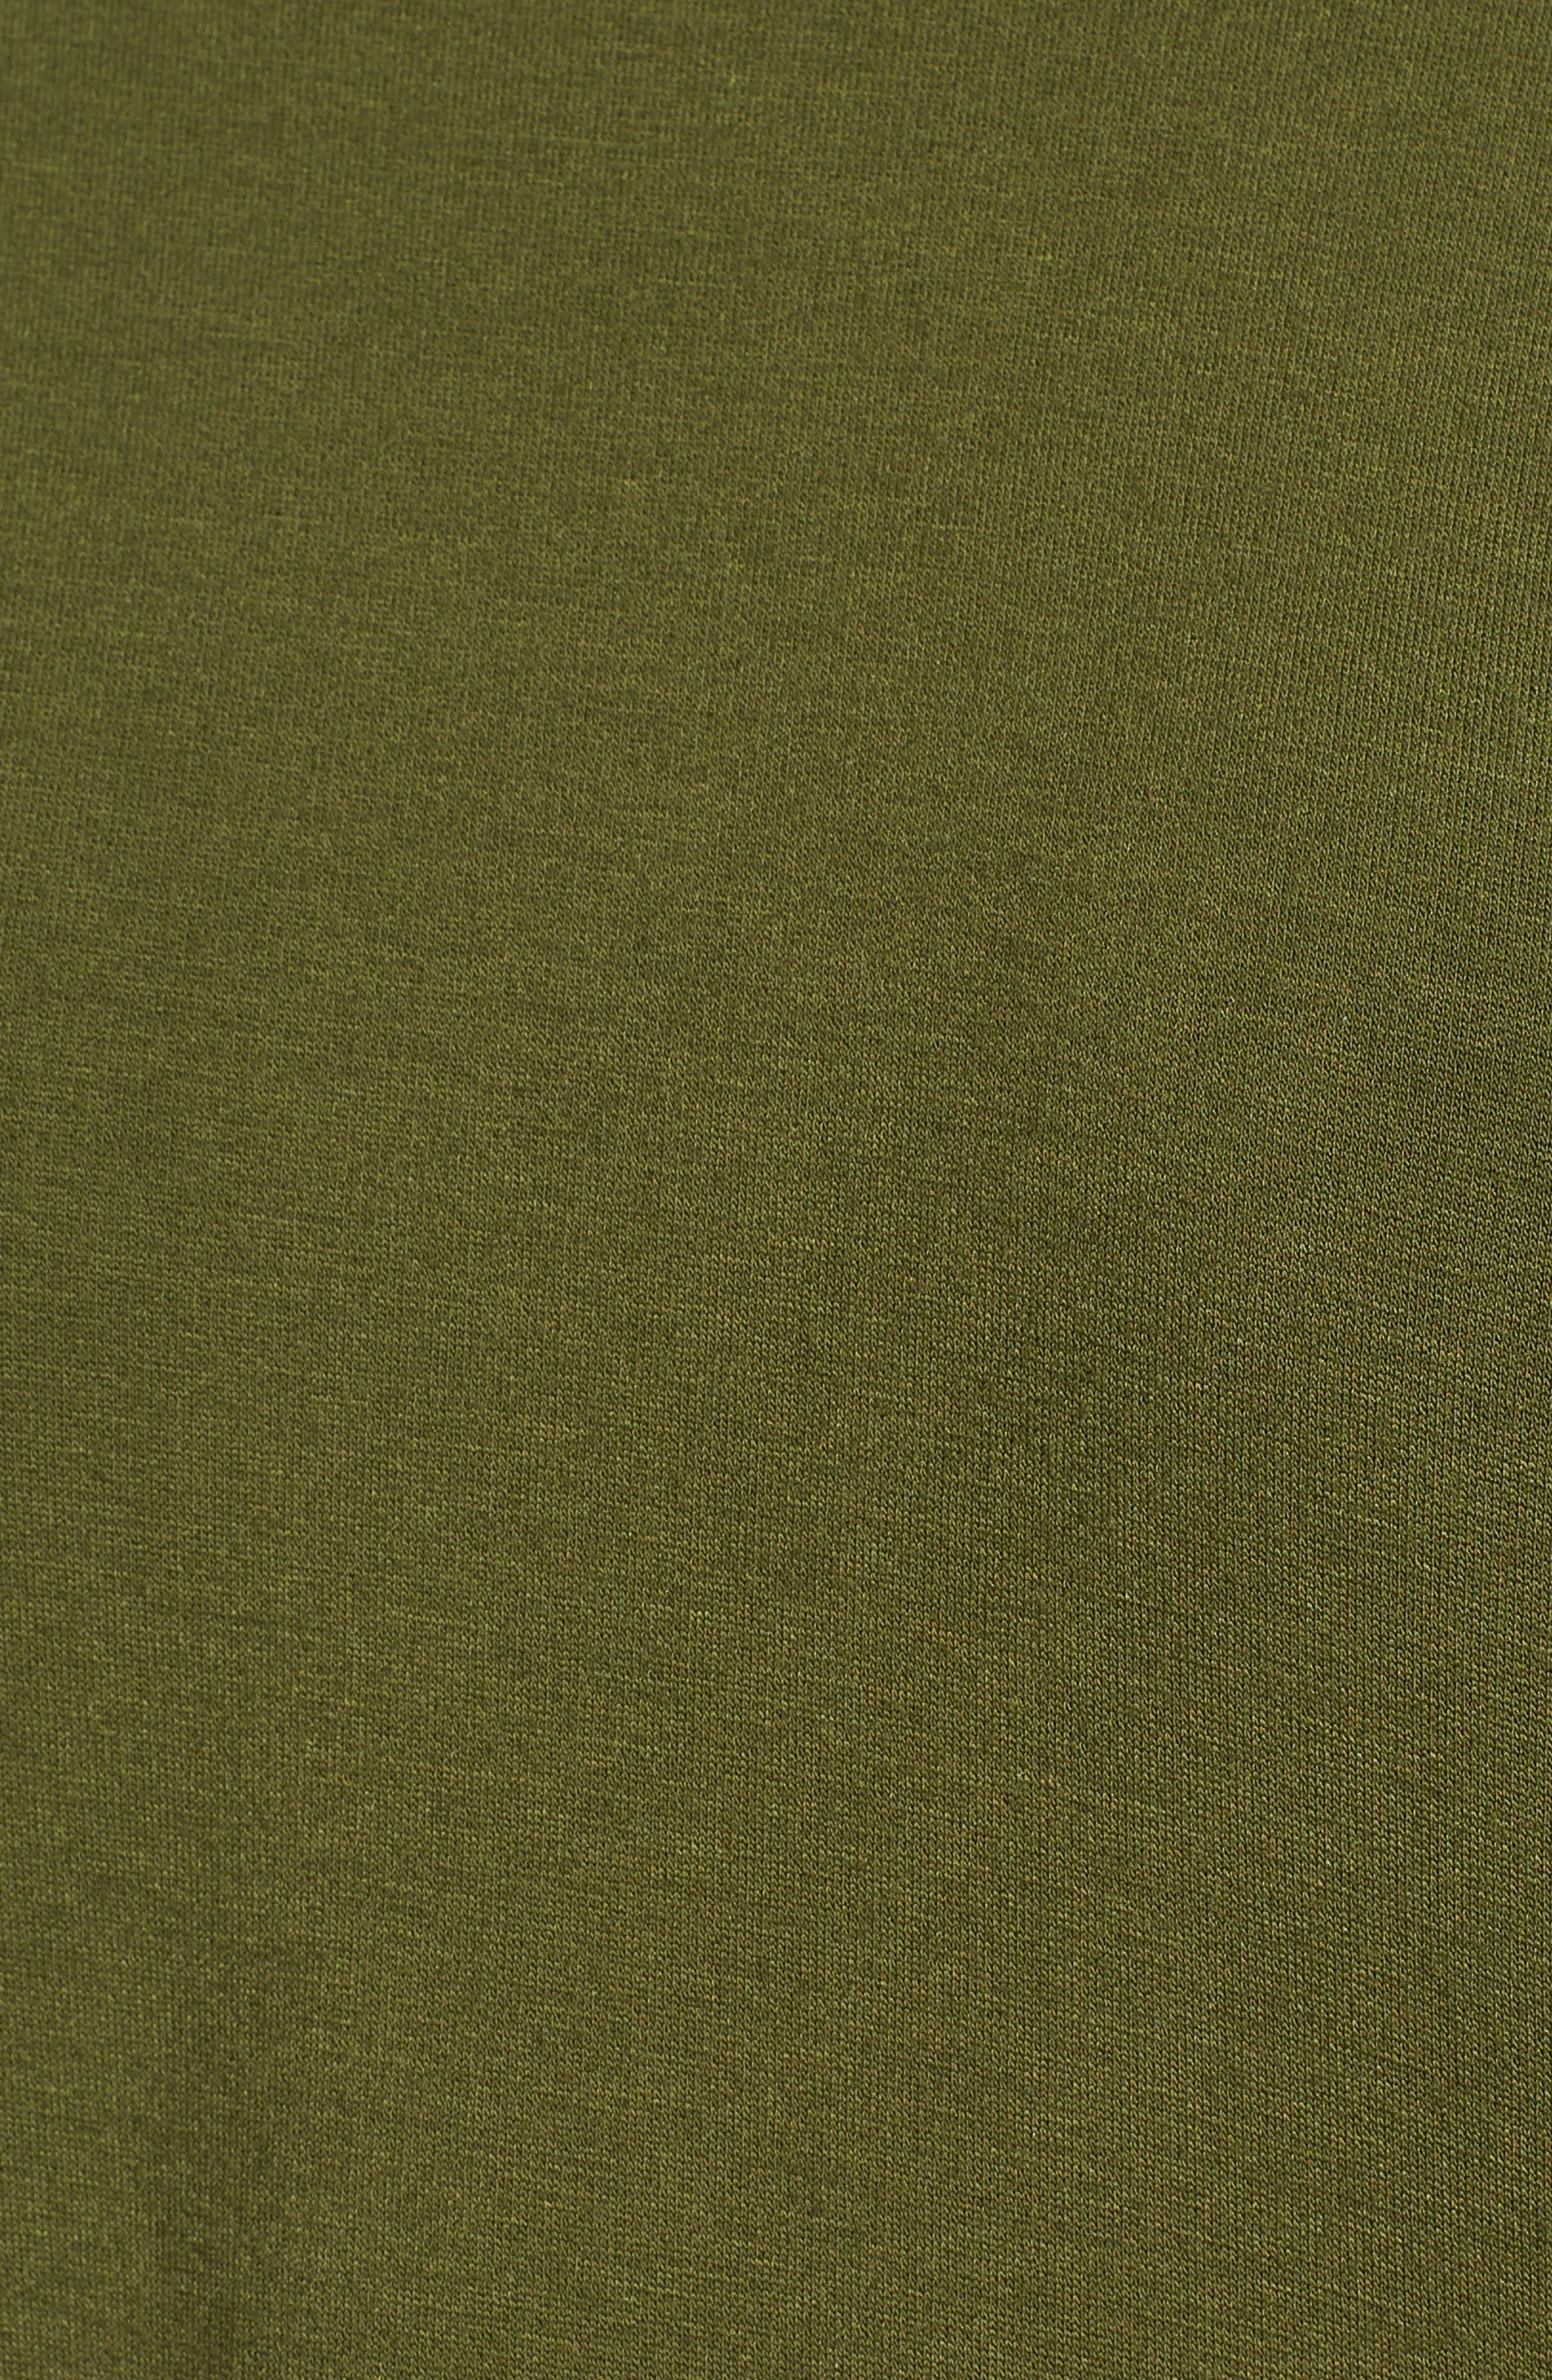 Raglan Sweatshirt,                             Alternate thumbnail 6, color,                             Olive